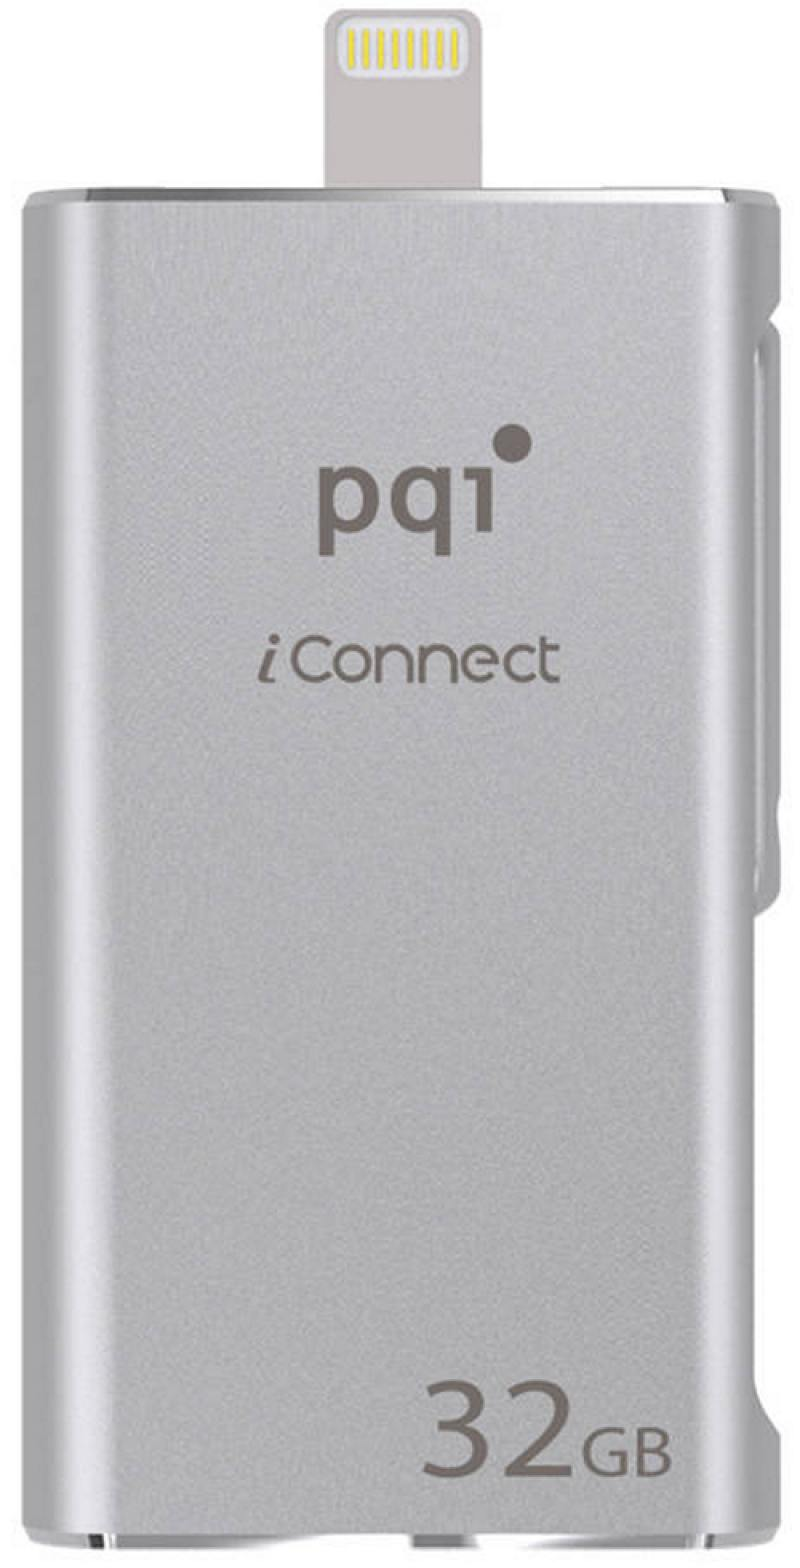 Флешка USB 32Gb PQI iConnect серебристый 6I01-032GR1001